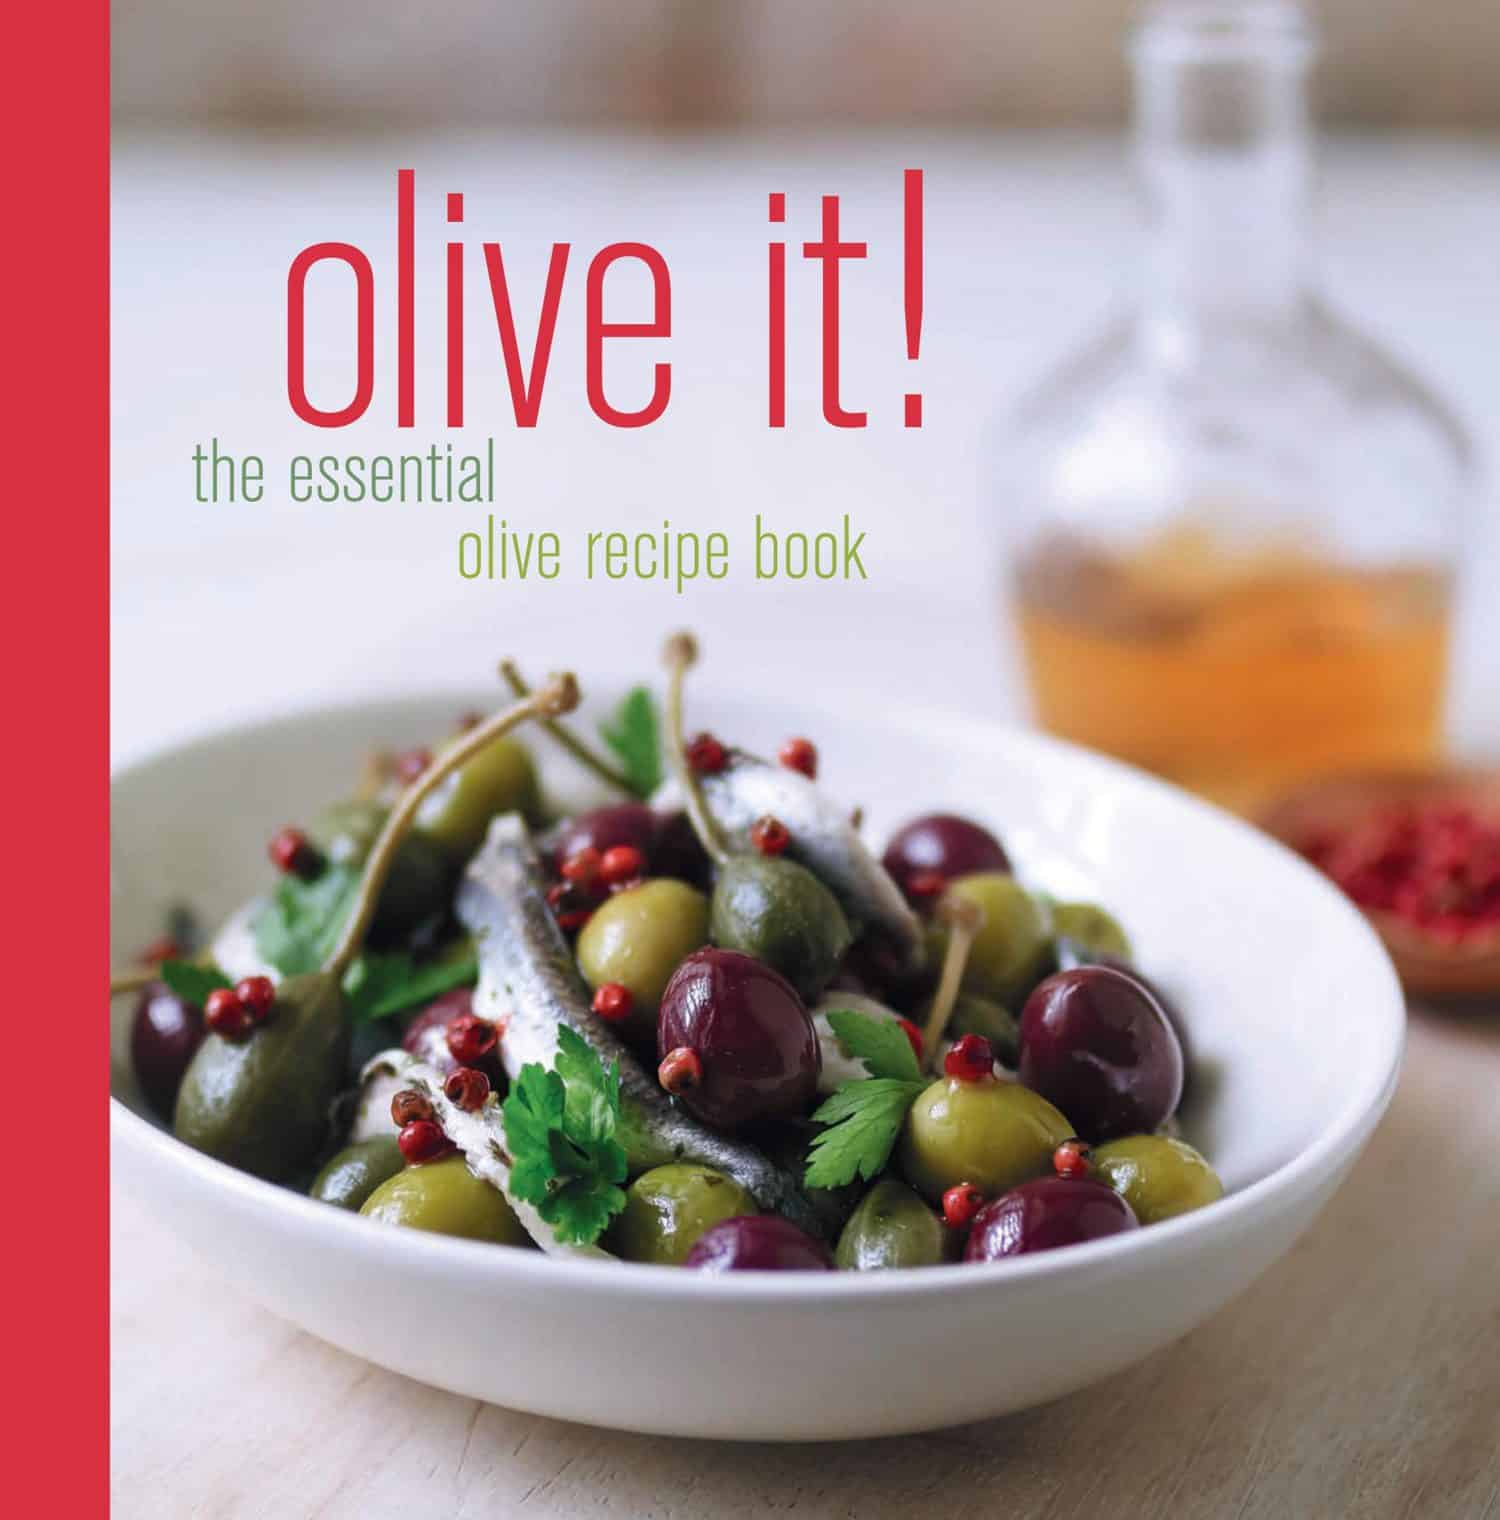 Olive it! cookbook giveaway